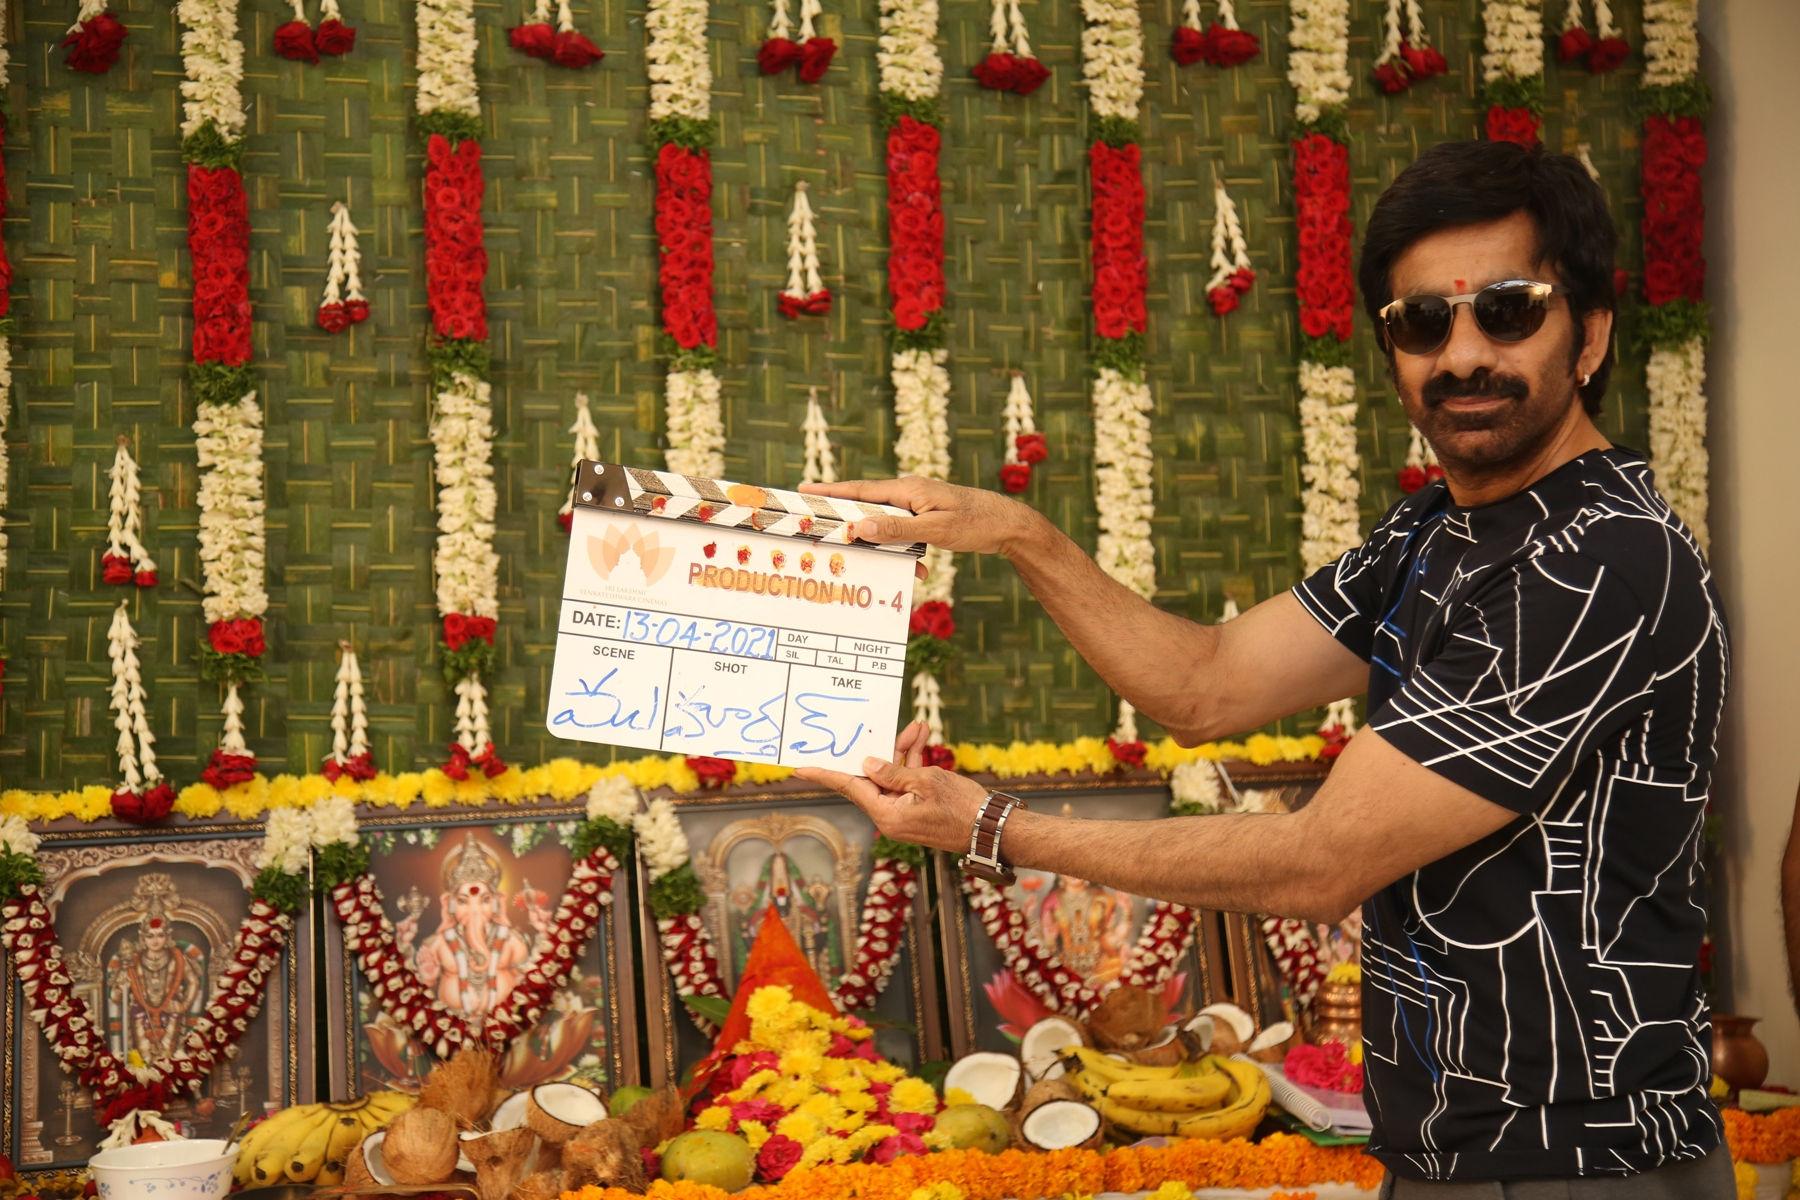 Hero Ravi Teja SLV Cinemas LLP Production No 4 Launched